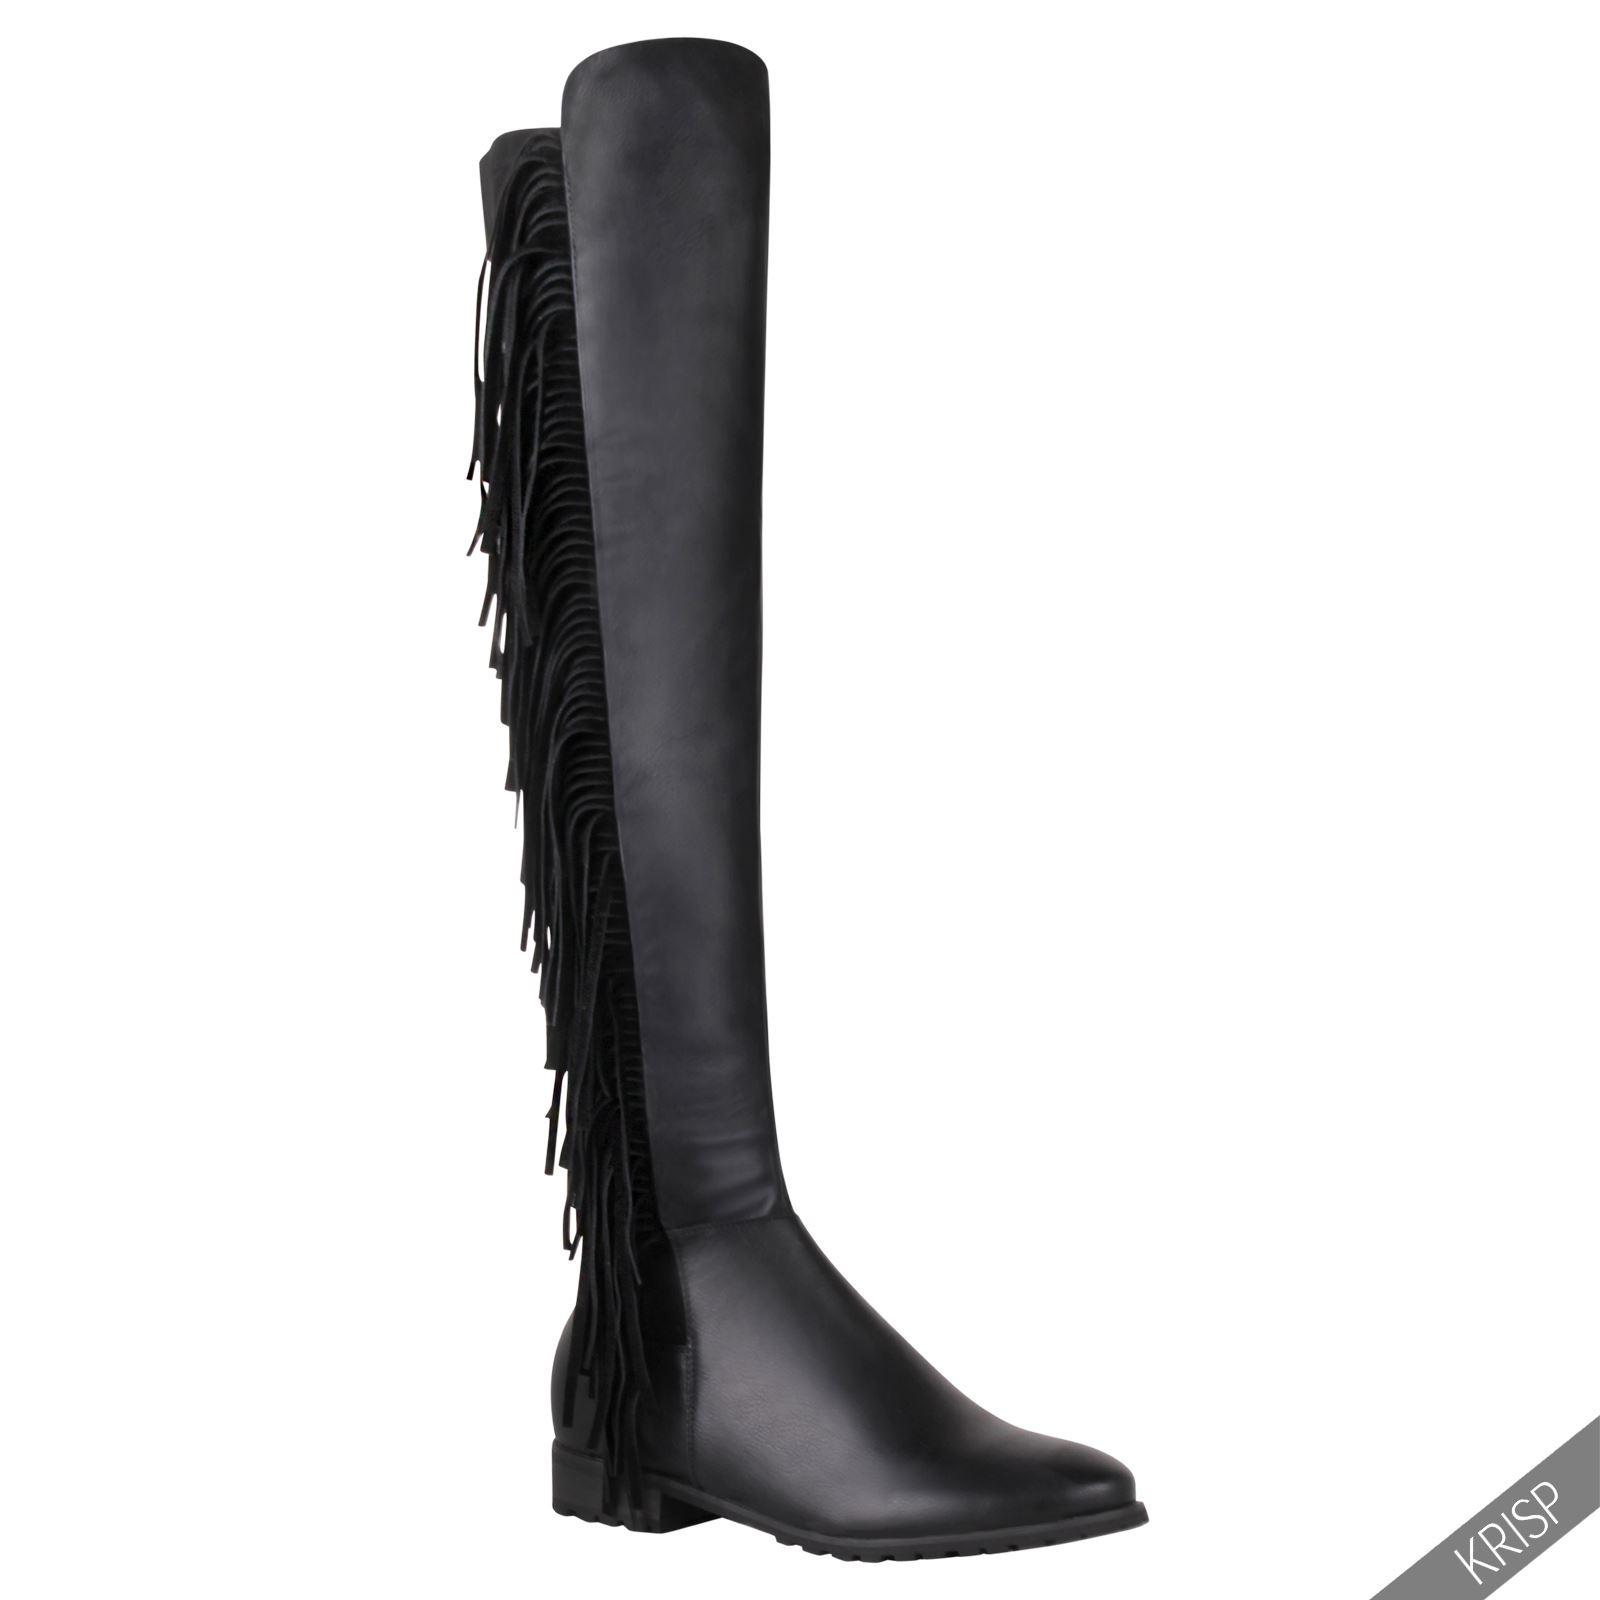 femmes bottes cuissardes noir cuir franges booties chaussures